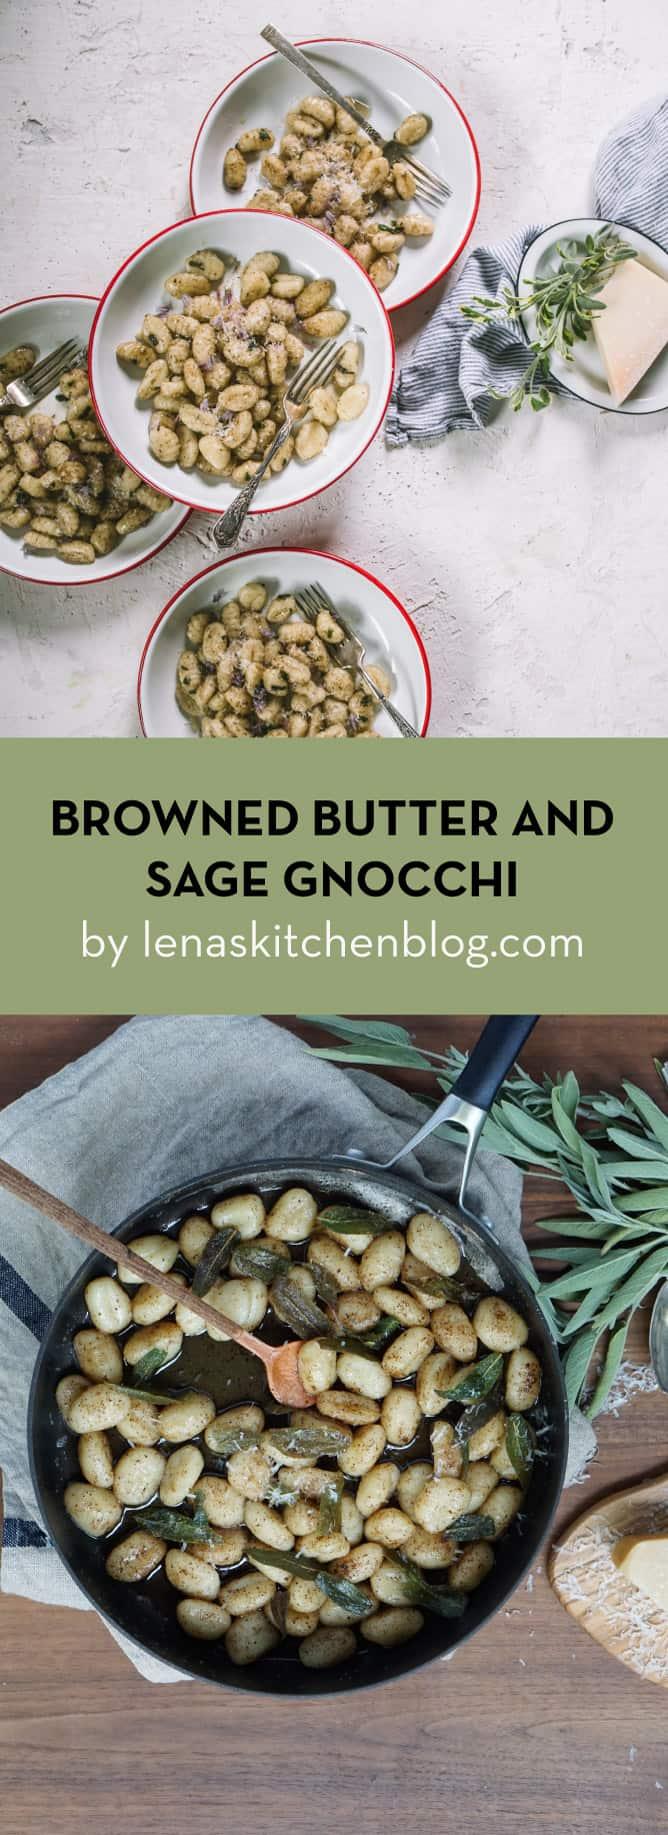 BROWNED BUTTER AND SAGE GNOCCHI by lenaskitchenblog.com